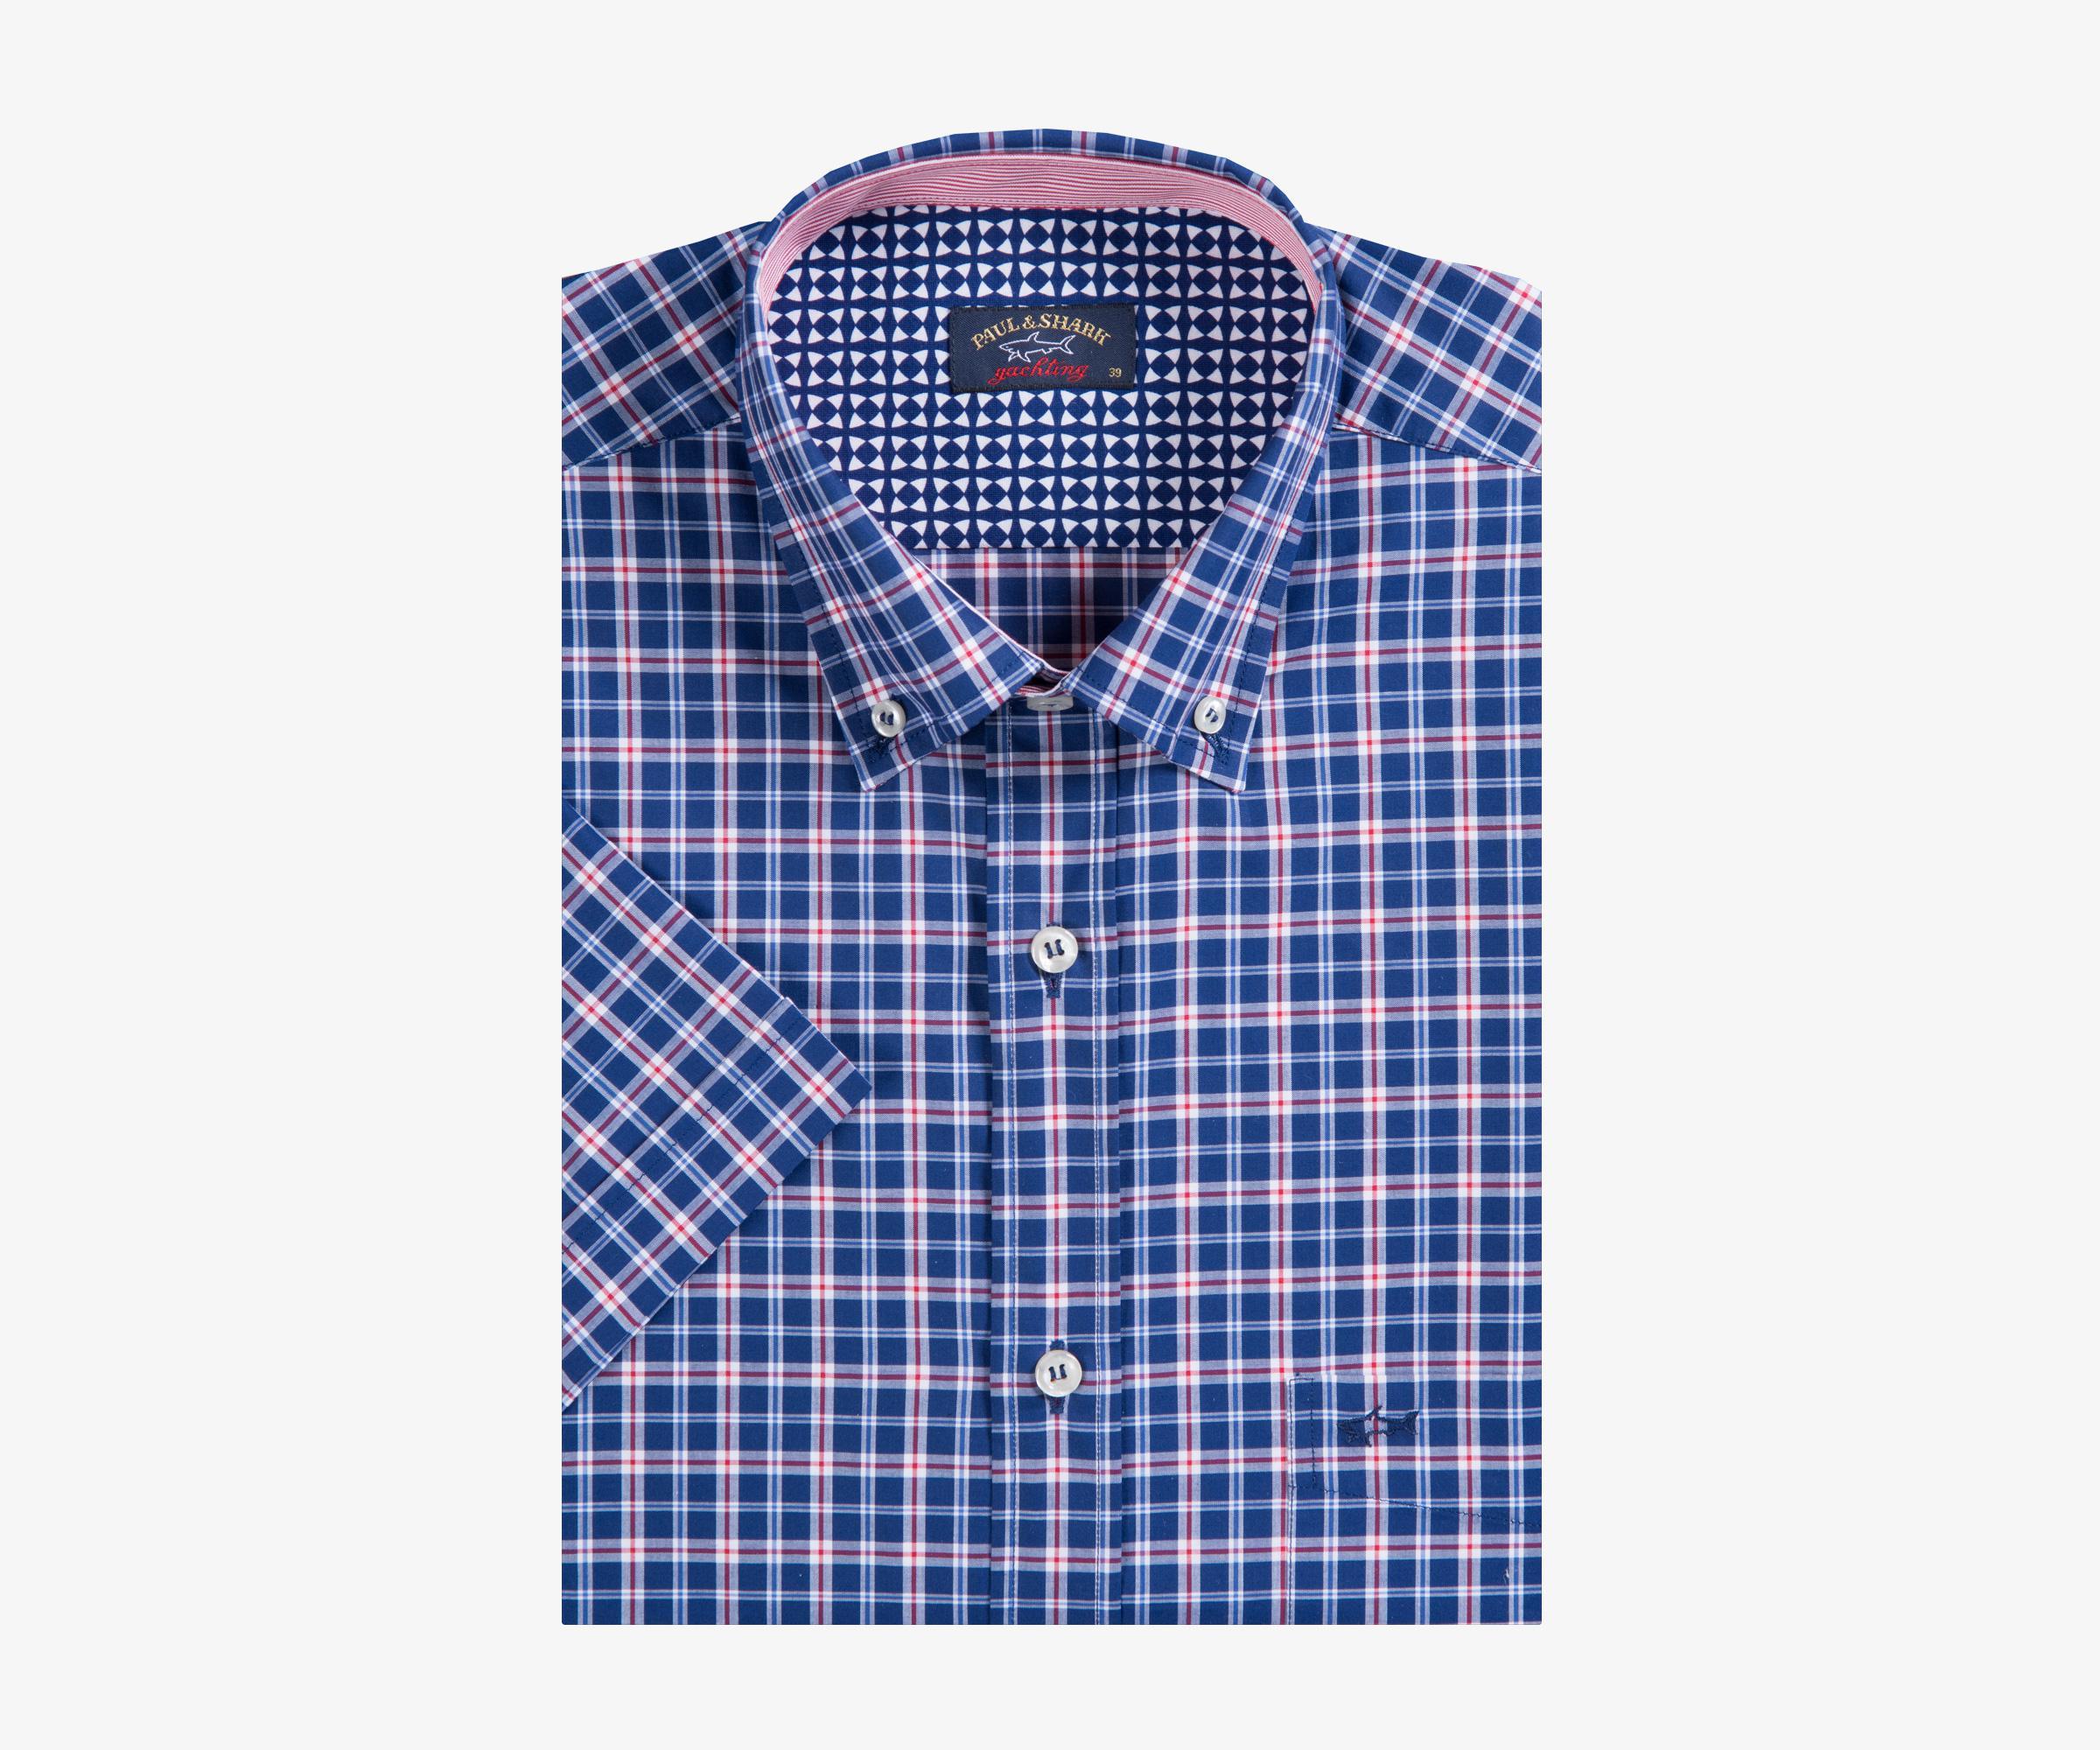 Paul & Shark Short Sleeve Check Shirt Blue Mens